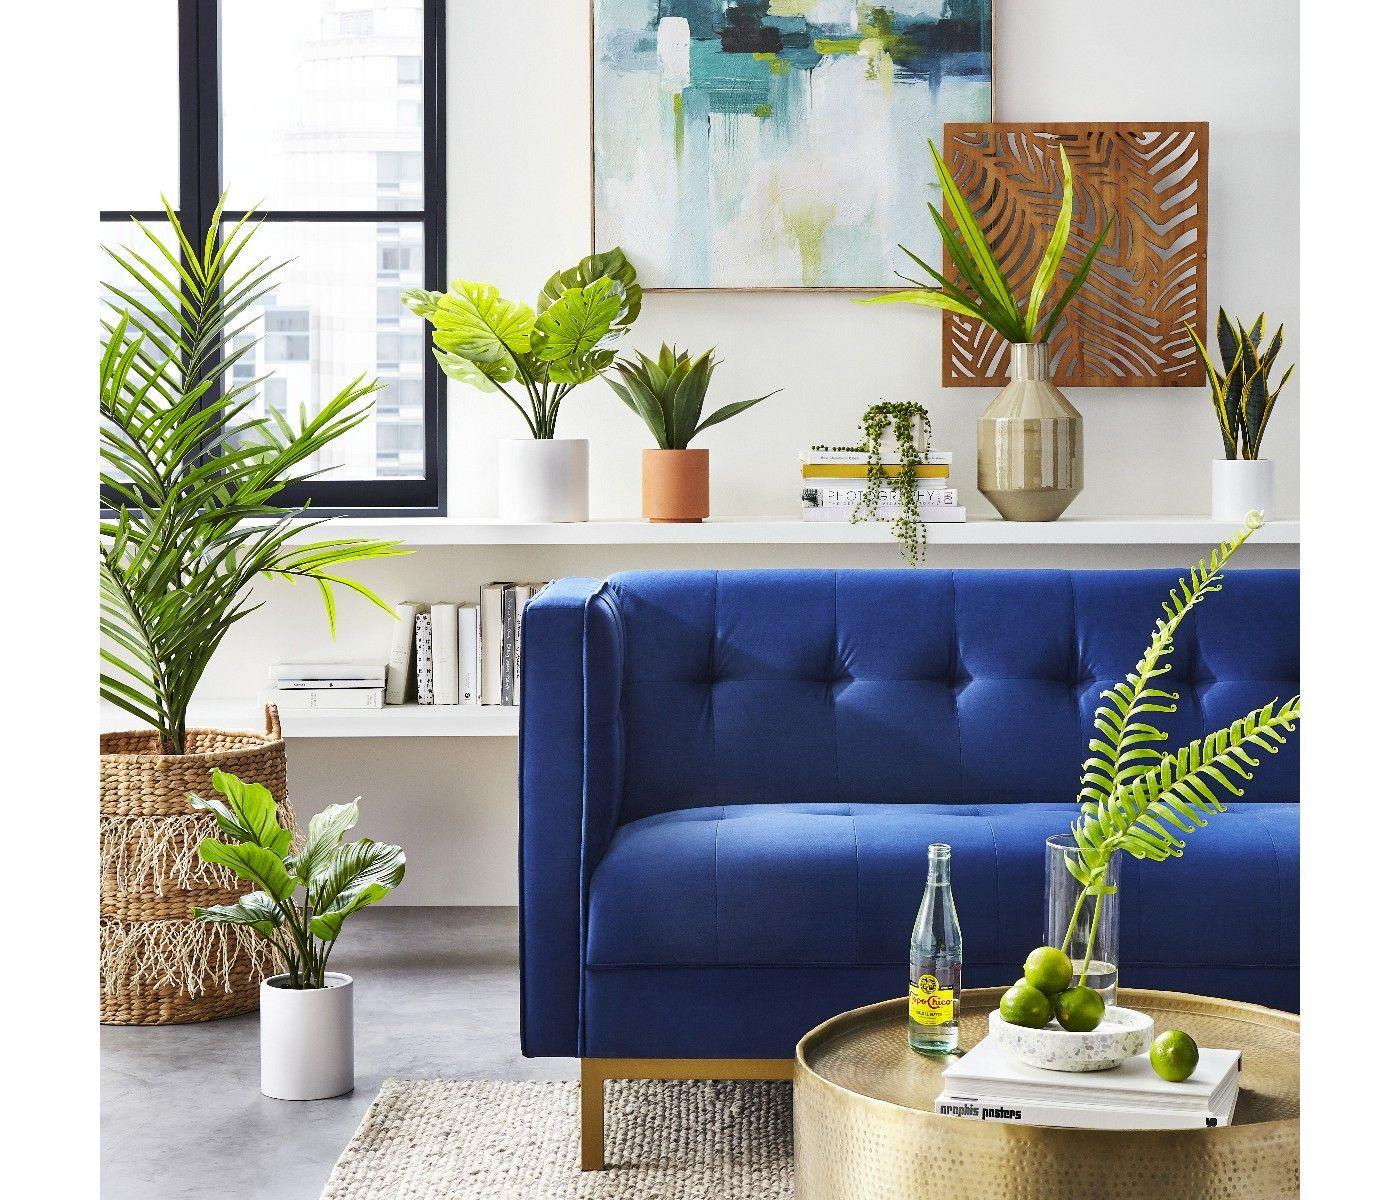 Target : Project 10™  Wohnzimmer dekor, Dekor, Haus deko